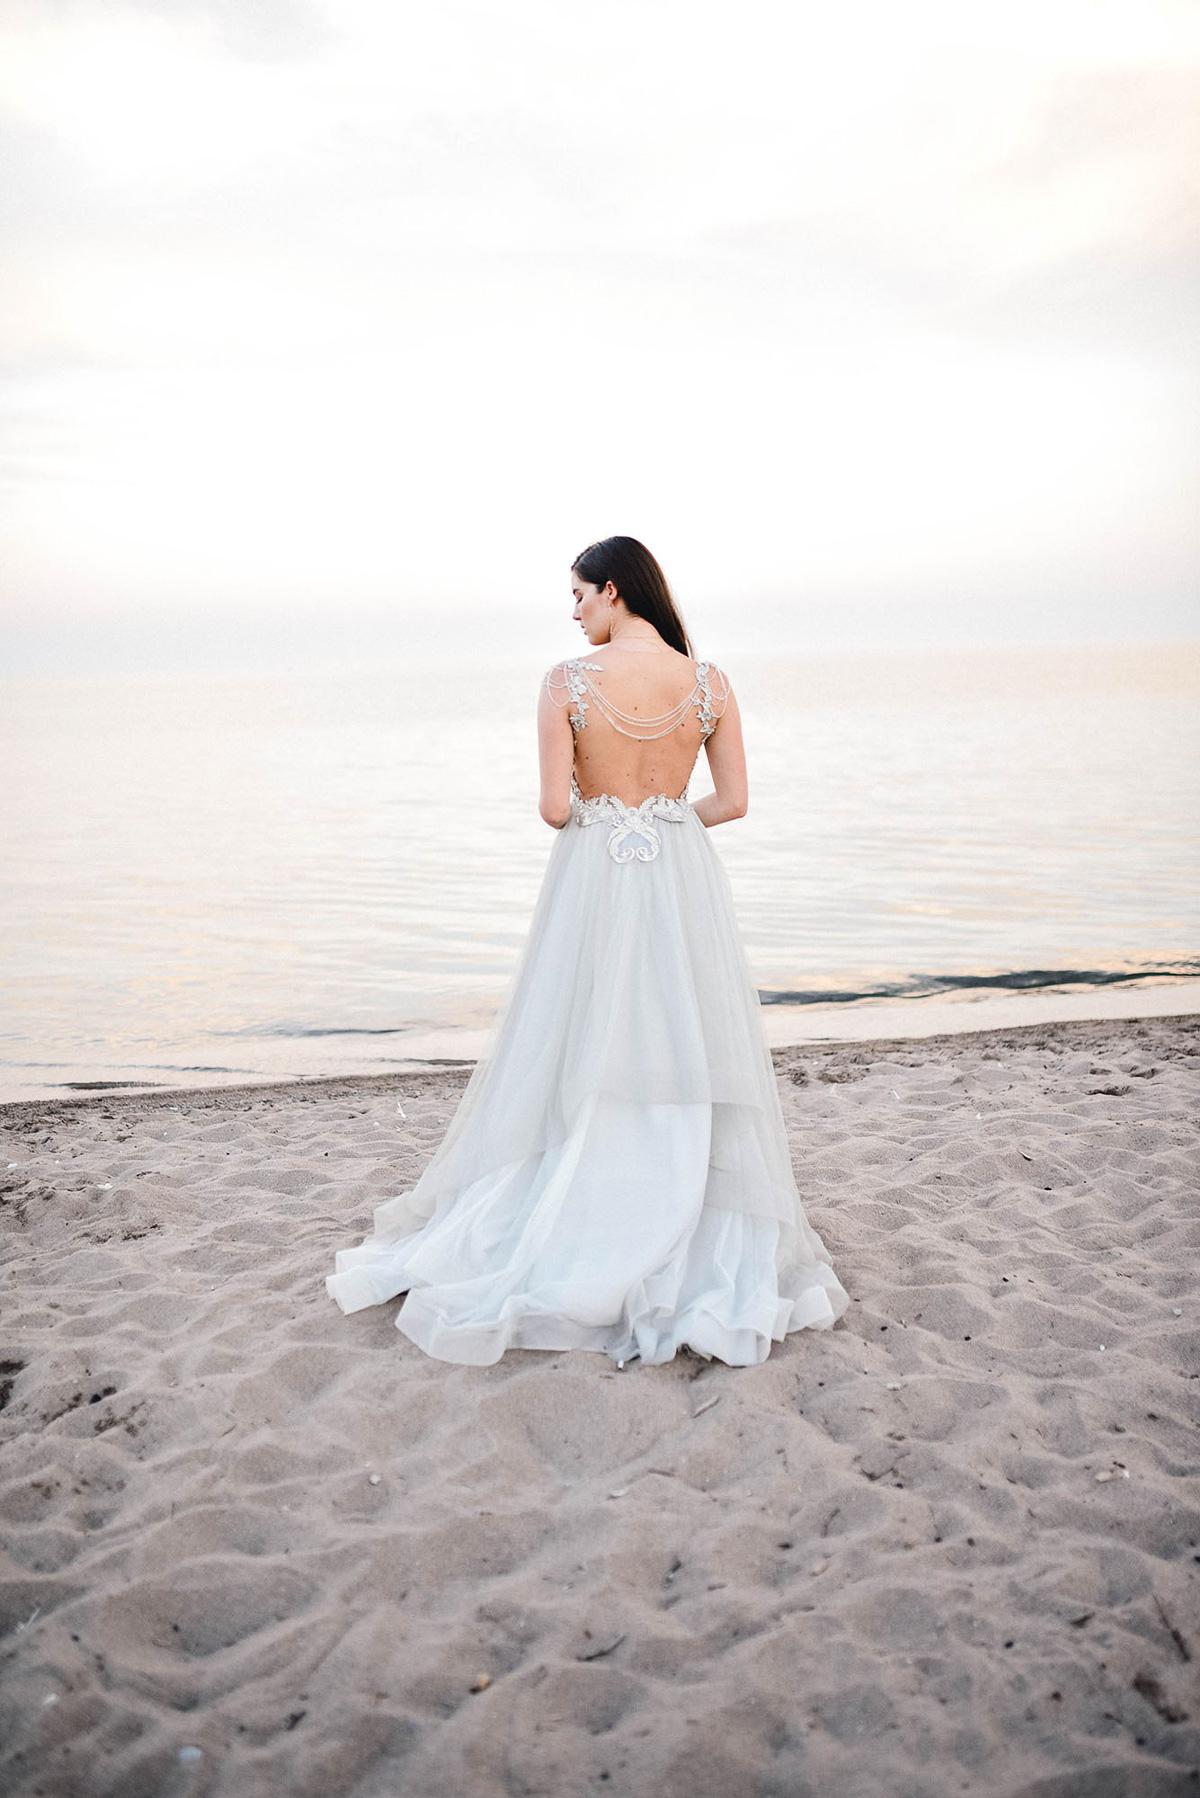 verveine-studios-vineyard-bride-swish-list-rouge-beach-park-scarborough-wedding-editorial-20.jpg